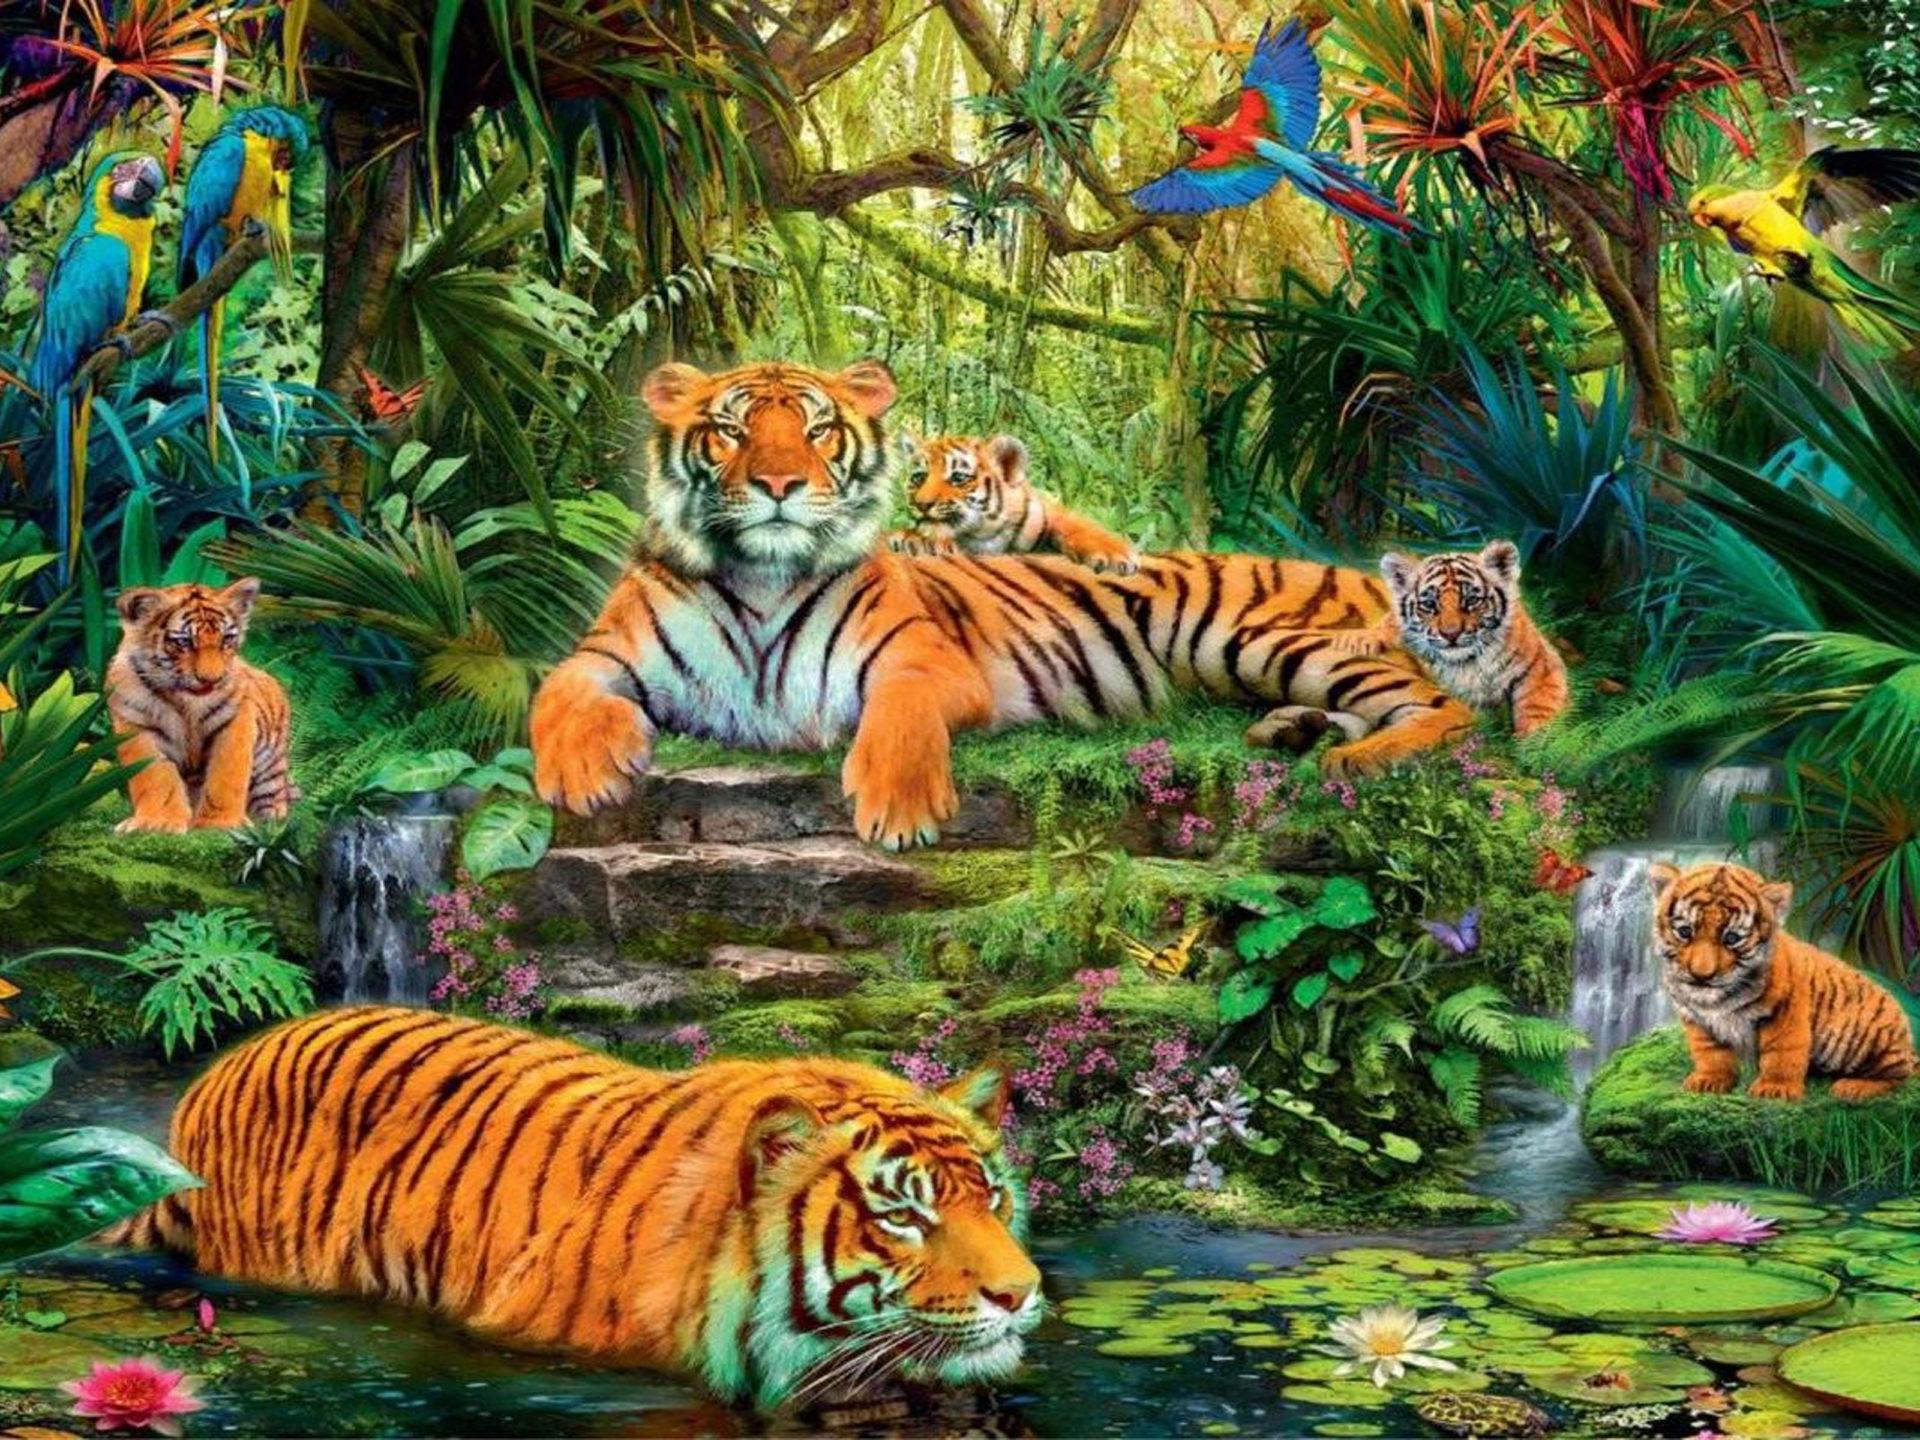 Stunning Black Wallpapers Animal Kingdom Jungle Tigers Birds Hd Wallpaper